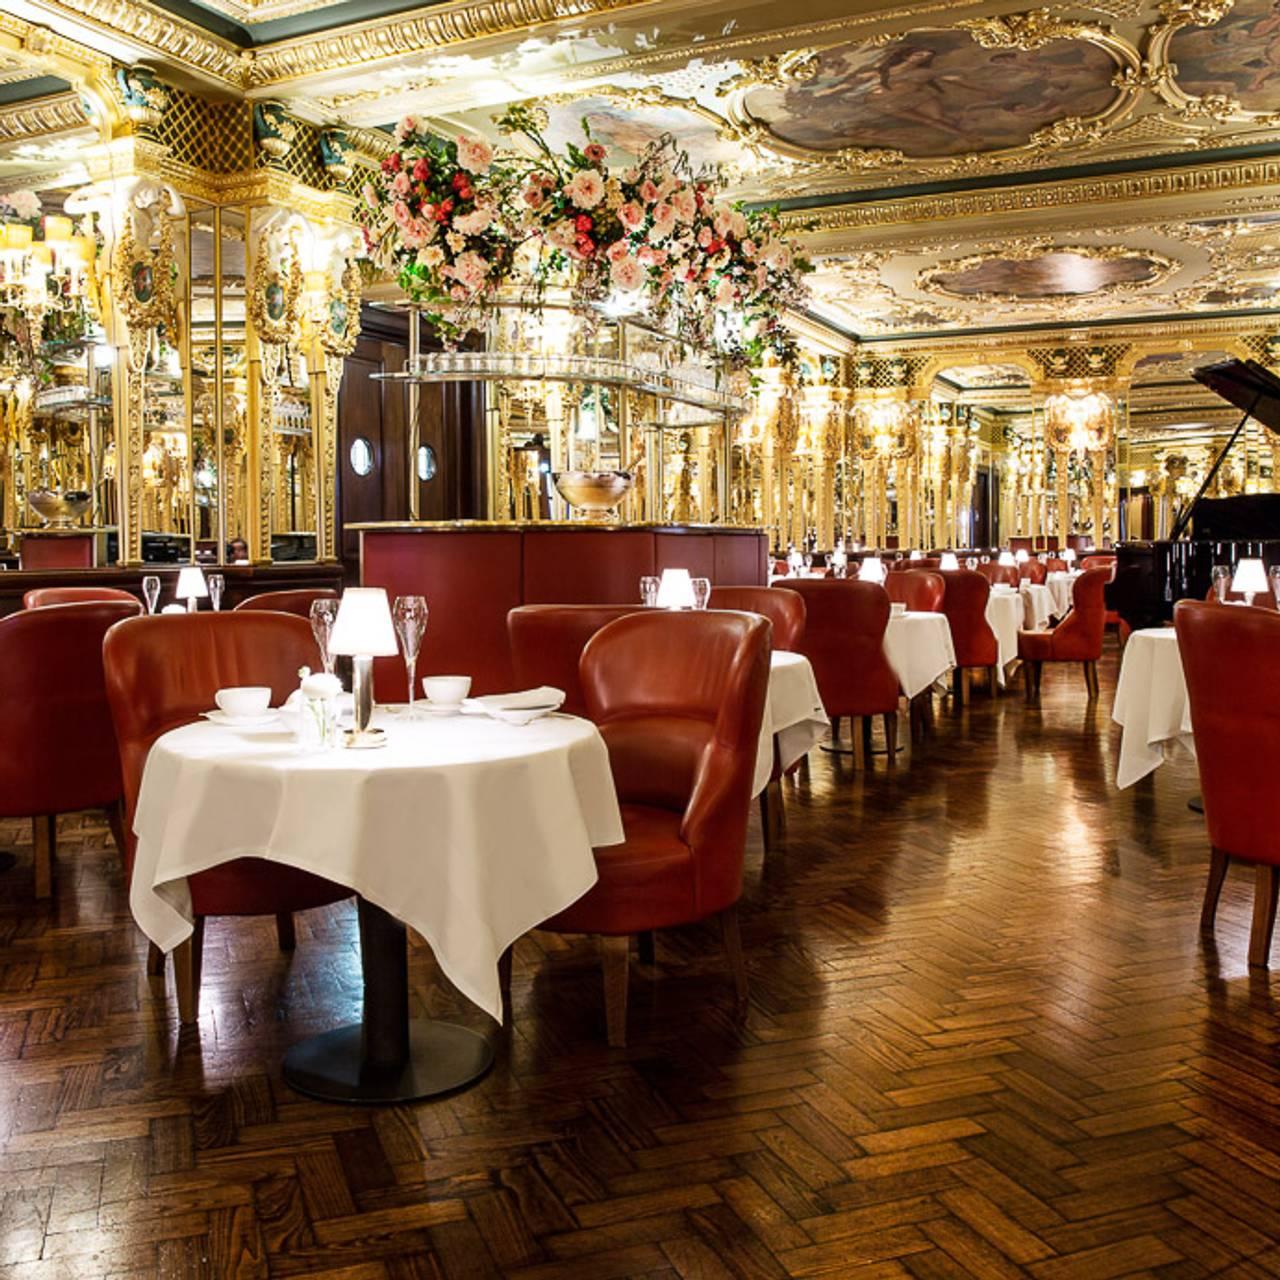 Afternoon tea at Hotel Café Royal Restaurant - London, | OpenTable